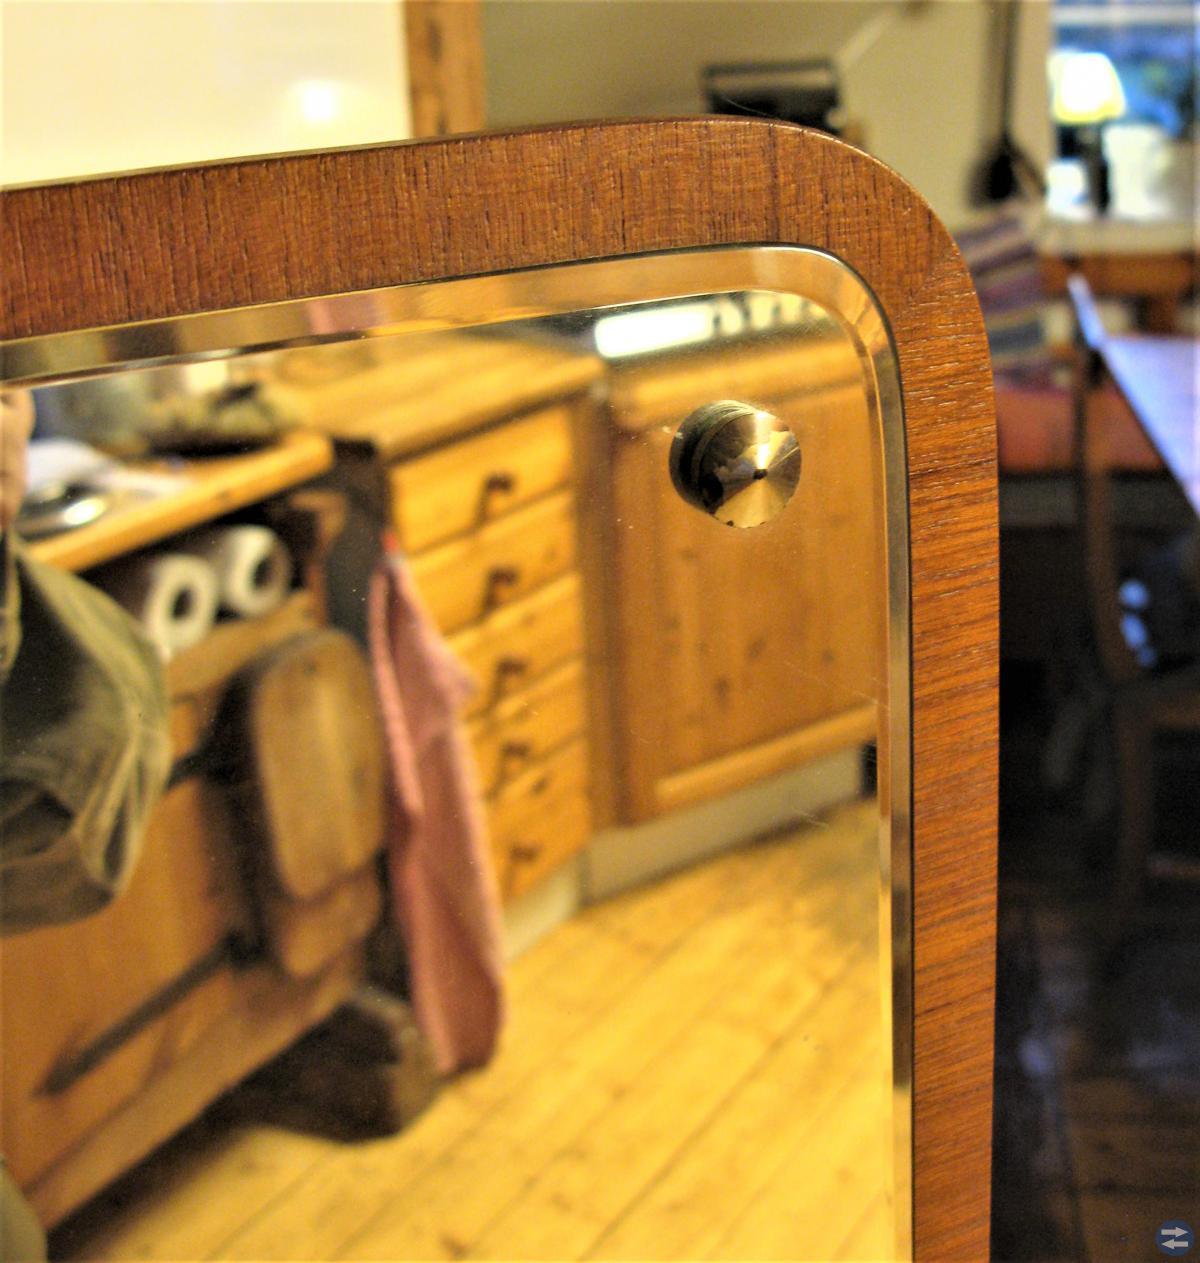 Helkroppsspegel med teakram. Eriksmålaglas.